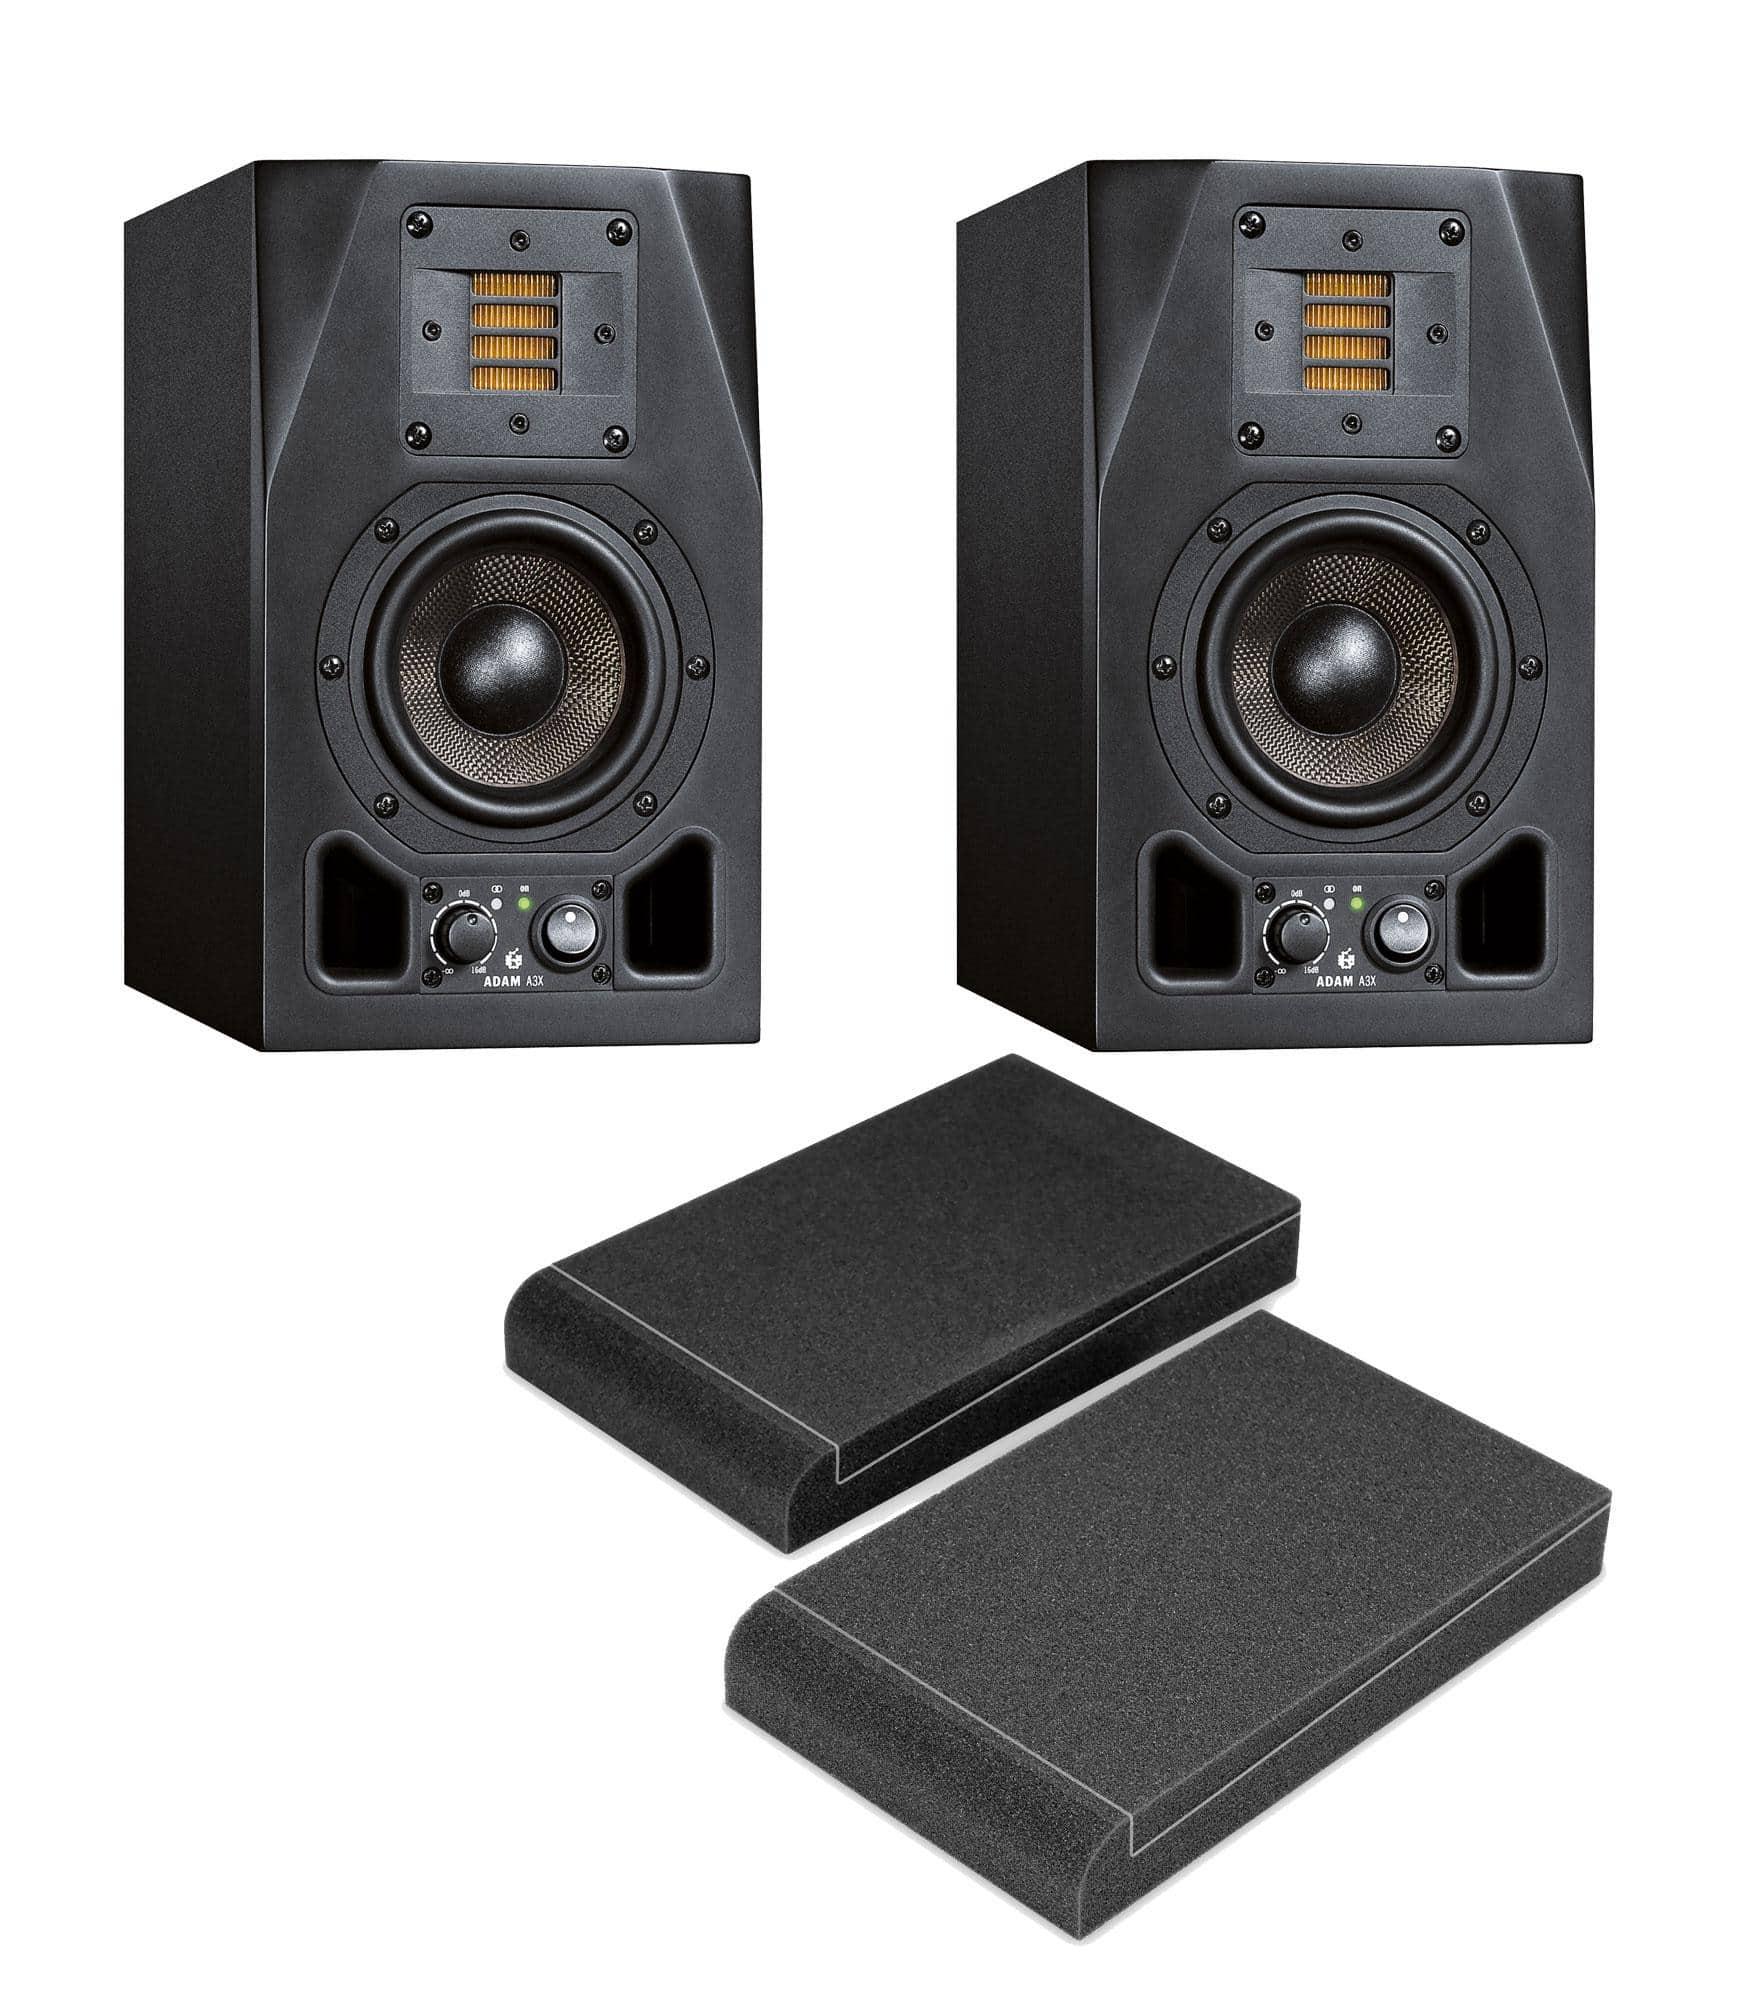 Studiomonitore - Adam Audio A3X ISO Bundle - Onlineshop Musikhaus Kirstein